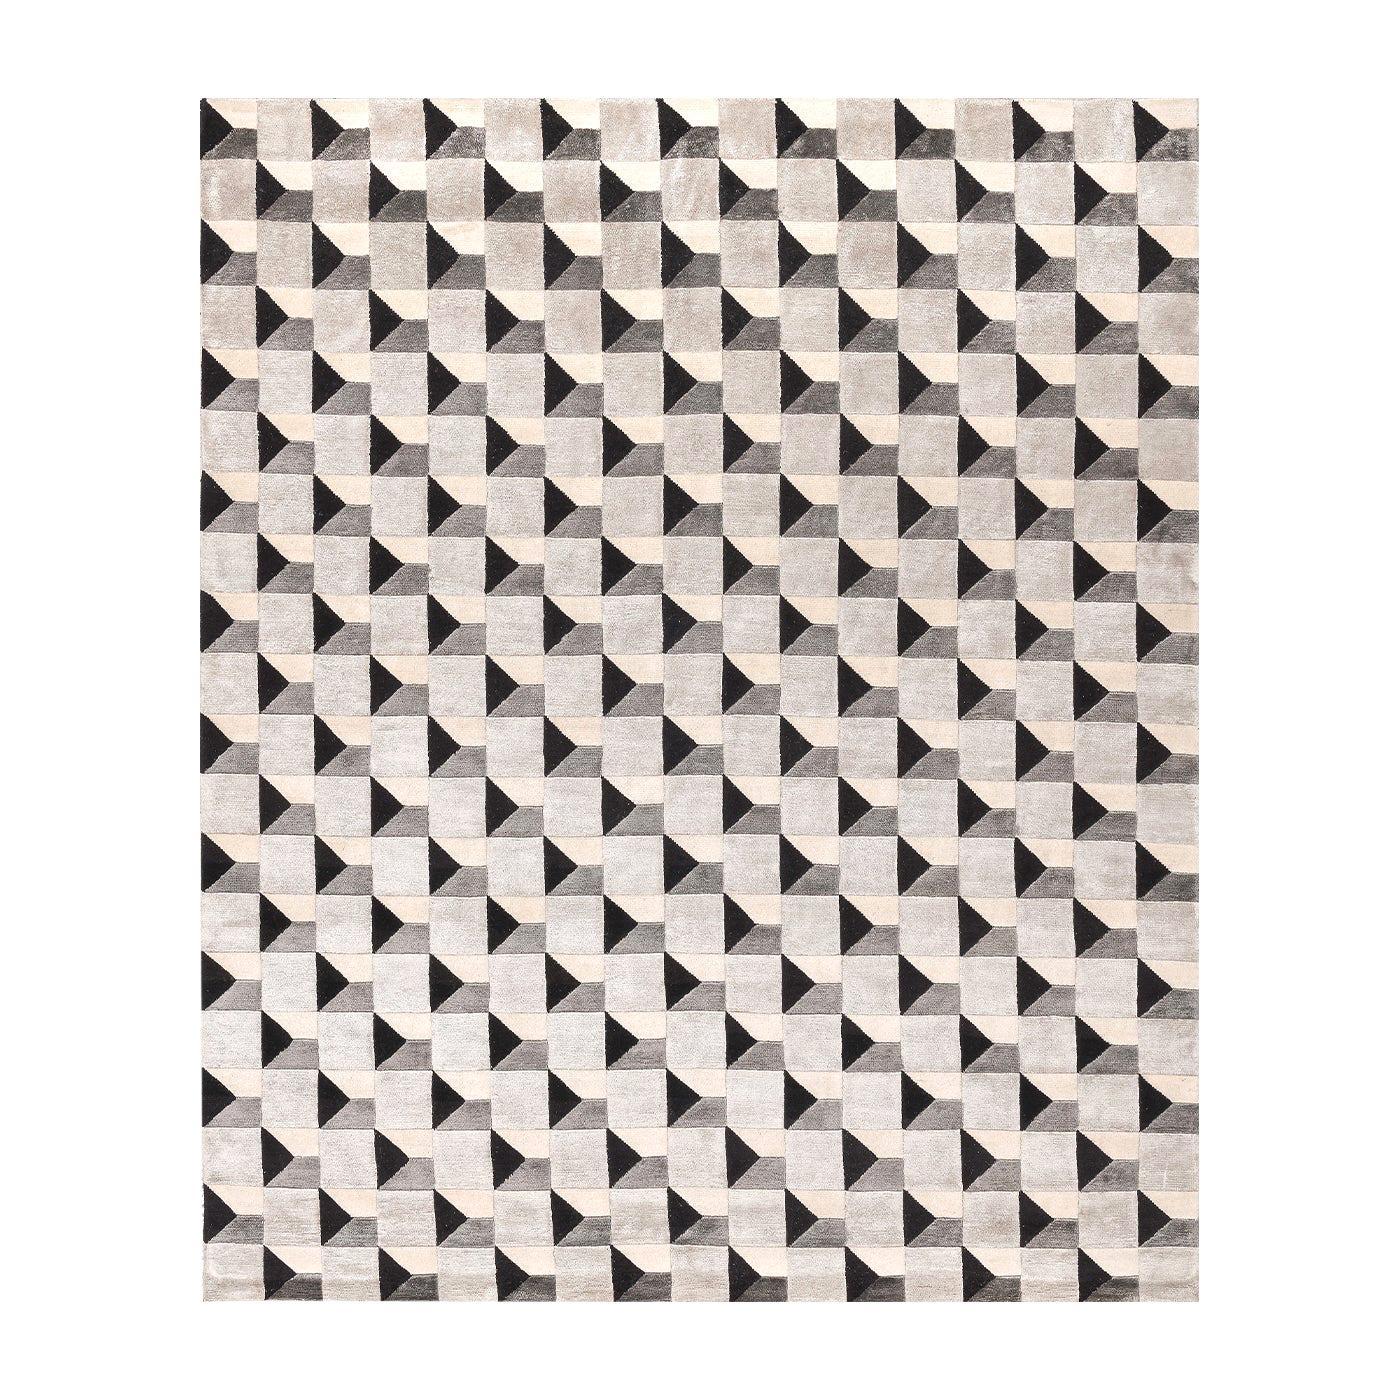 Grid Rug Design Collection